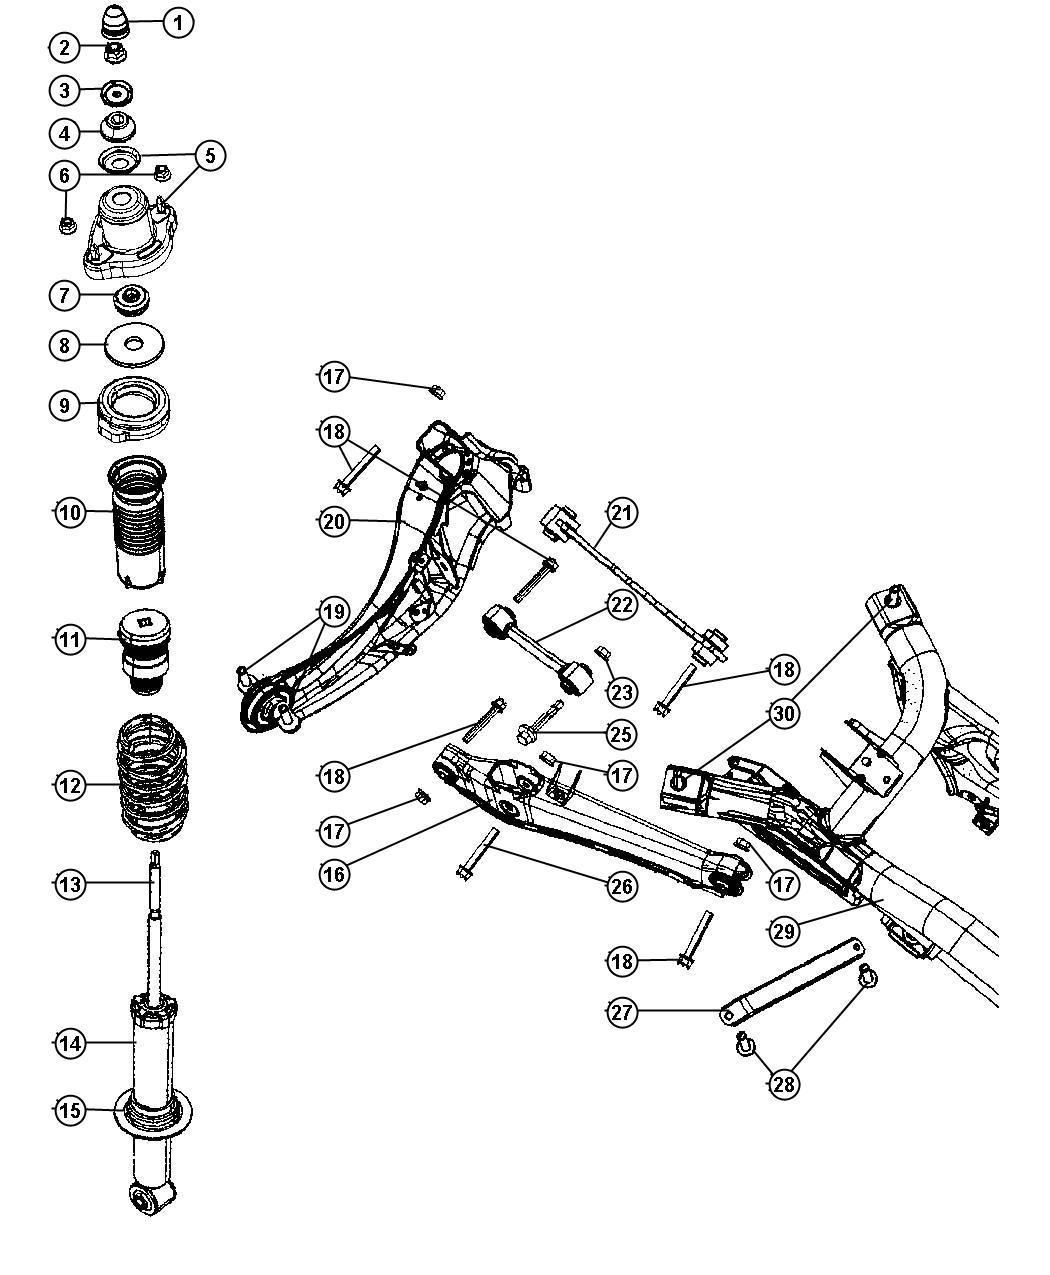 2007 dodge caliber radio wiring diagram 7 way flat pin trailer for engine